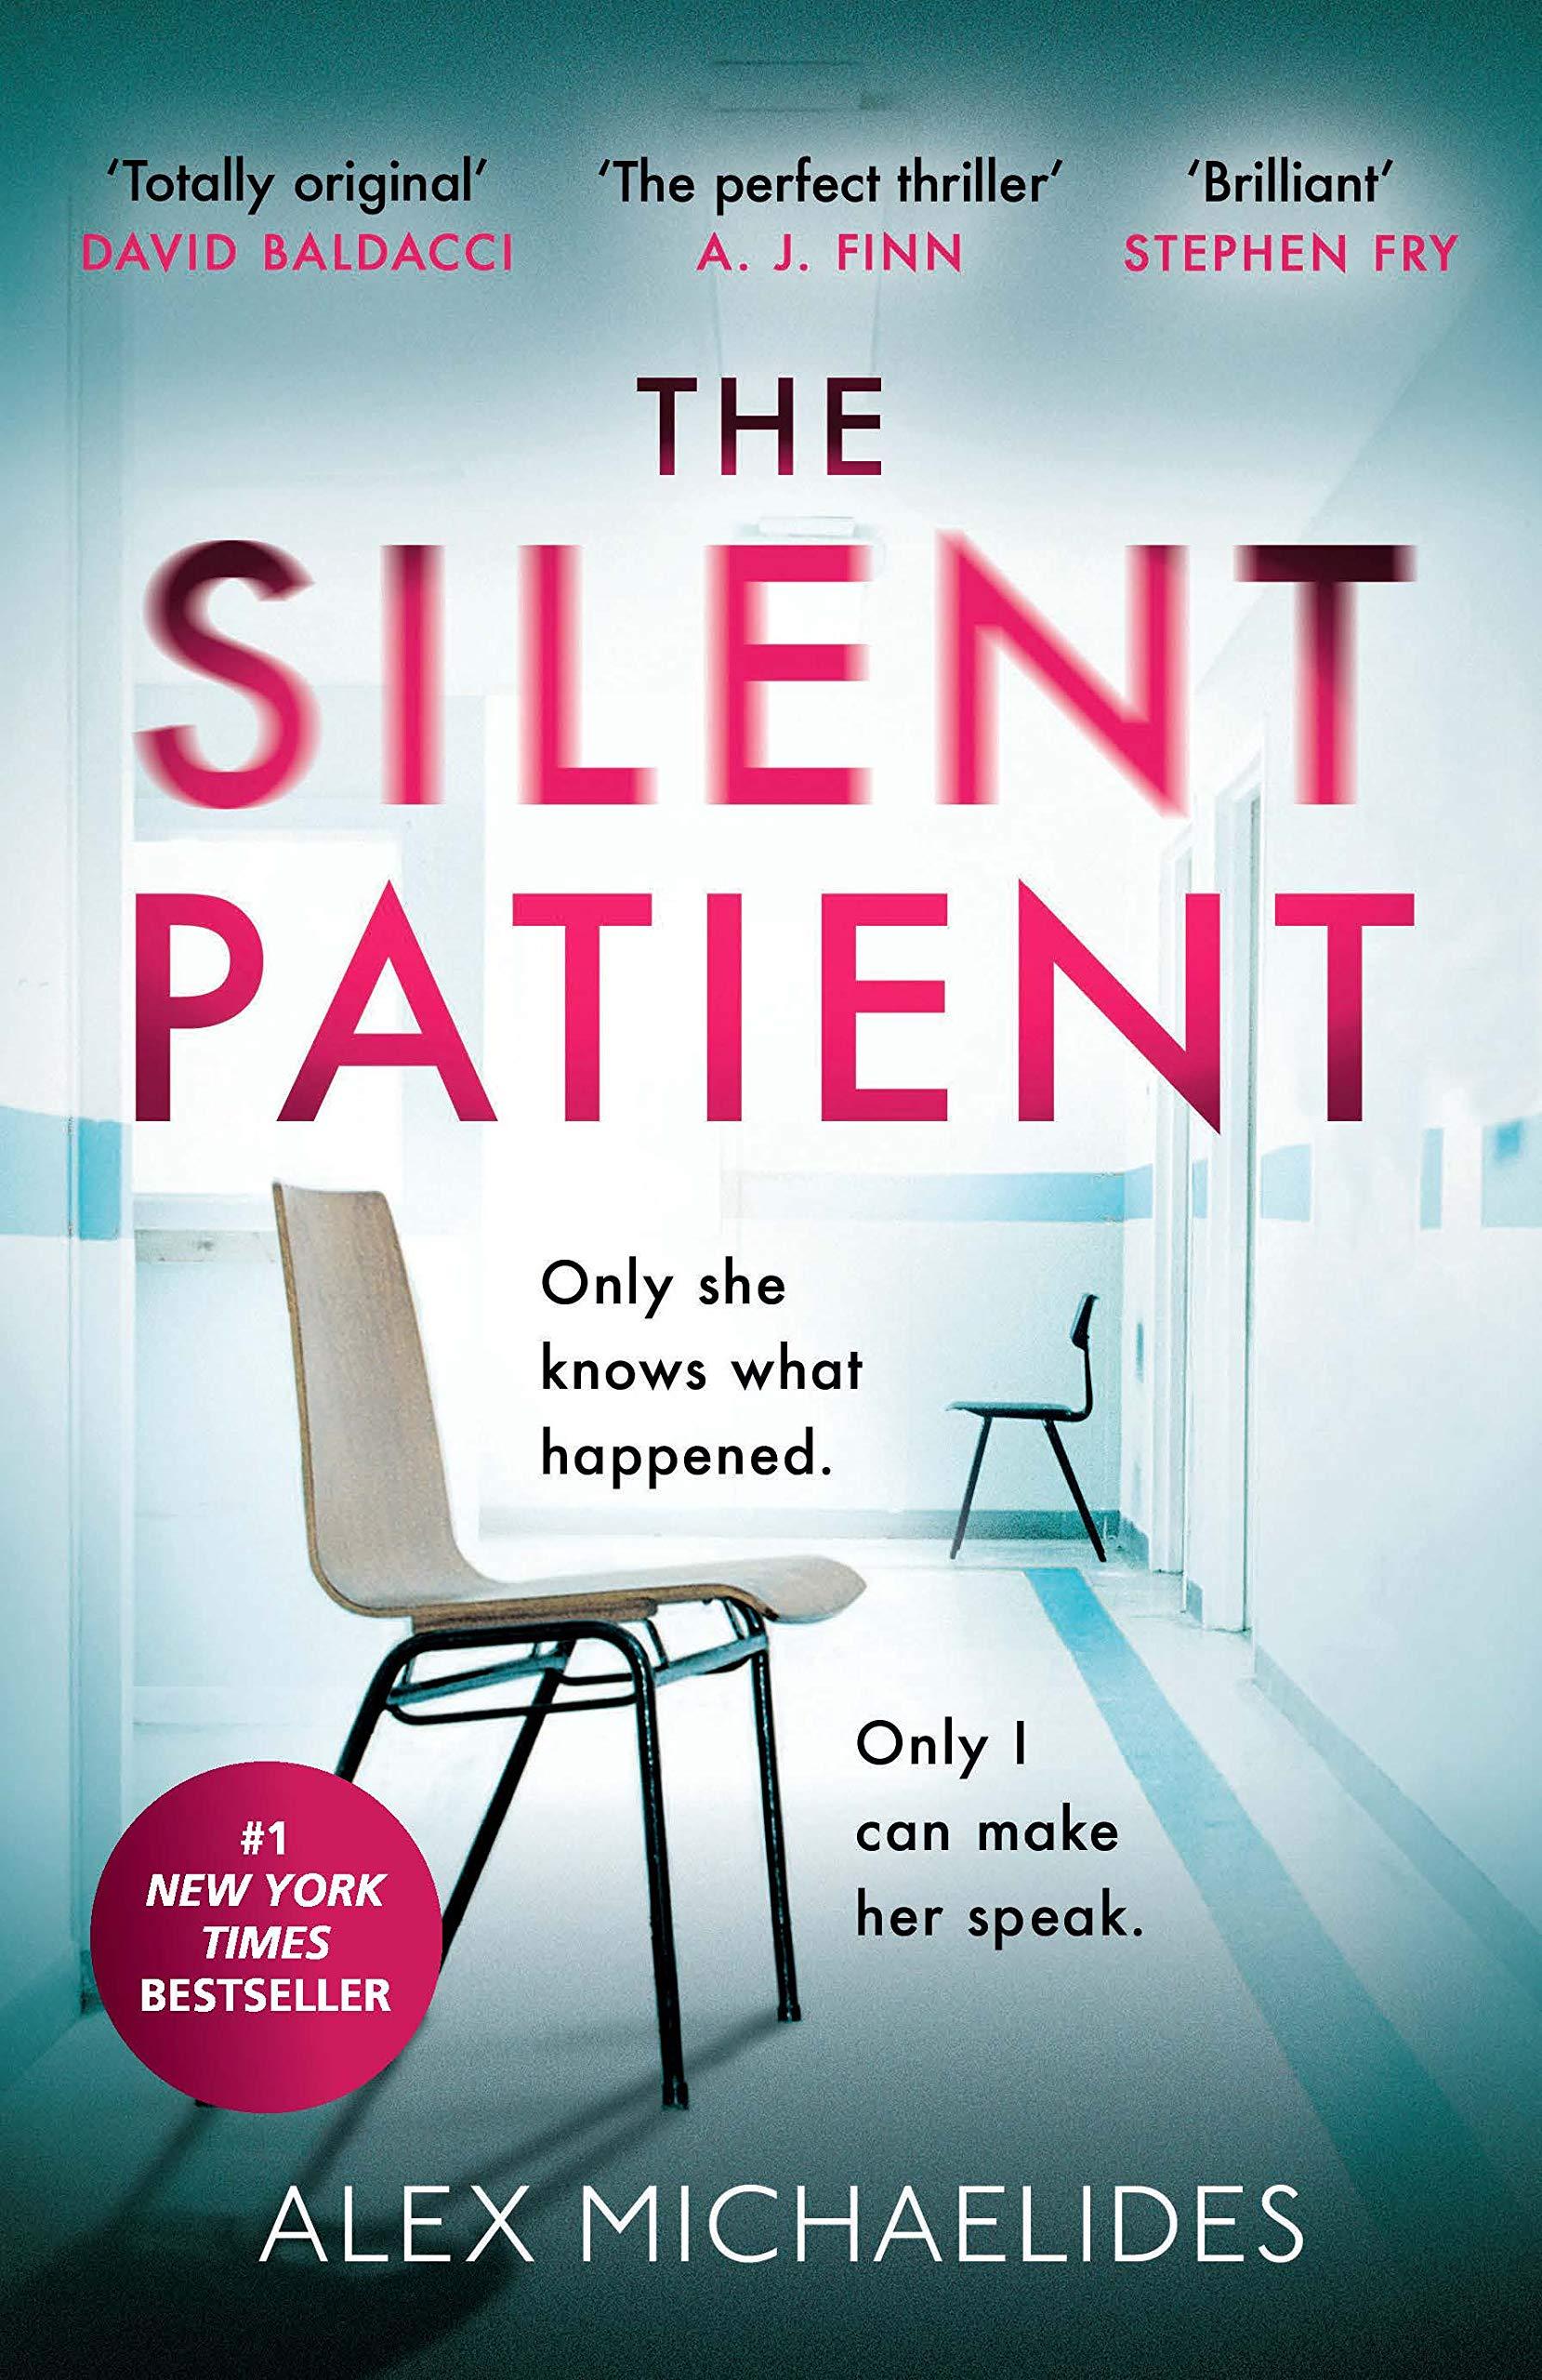 Book Review: The Silent Patient by Alex Michaelides